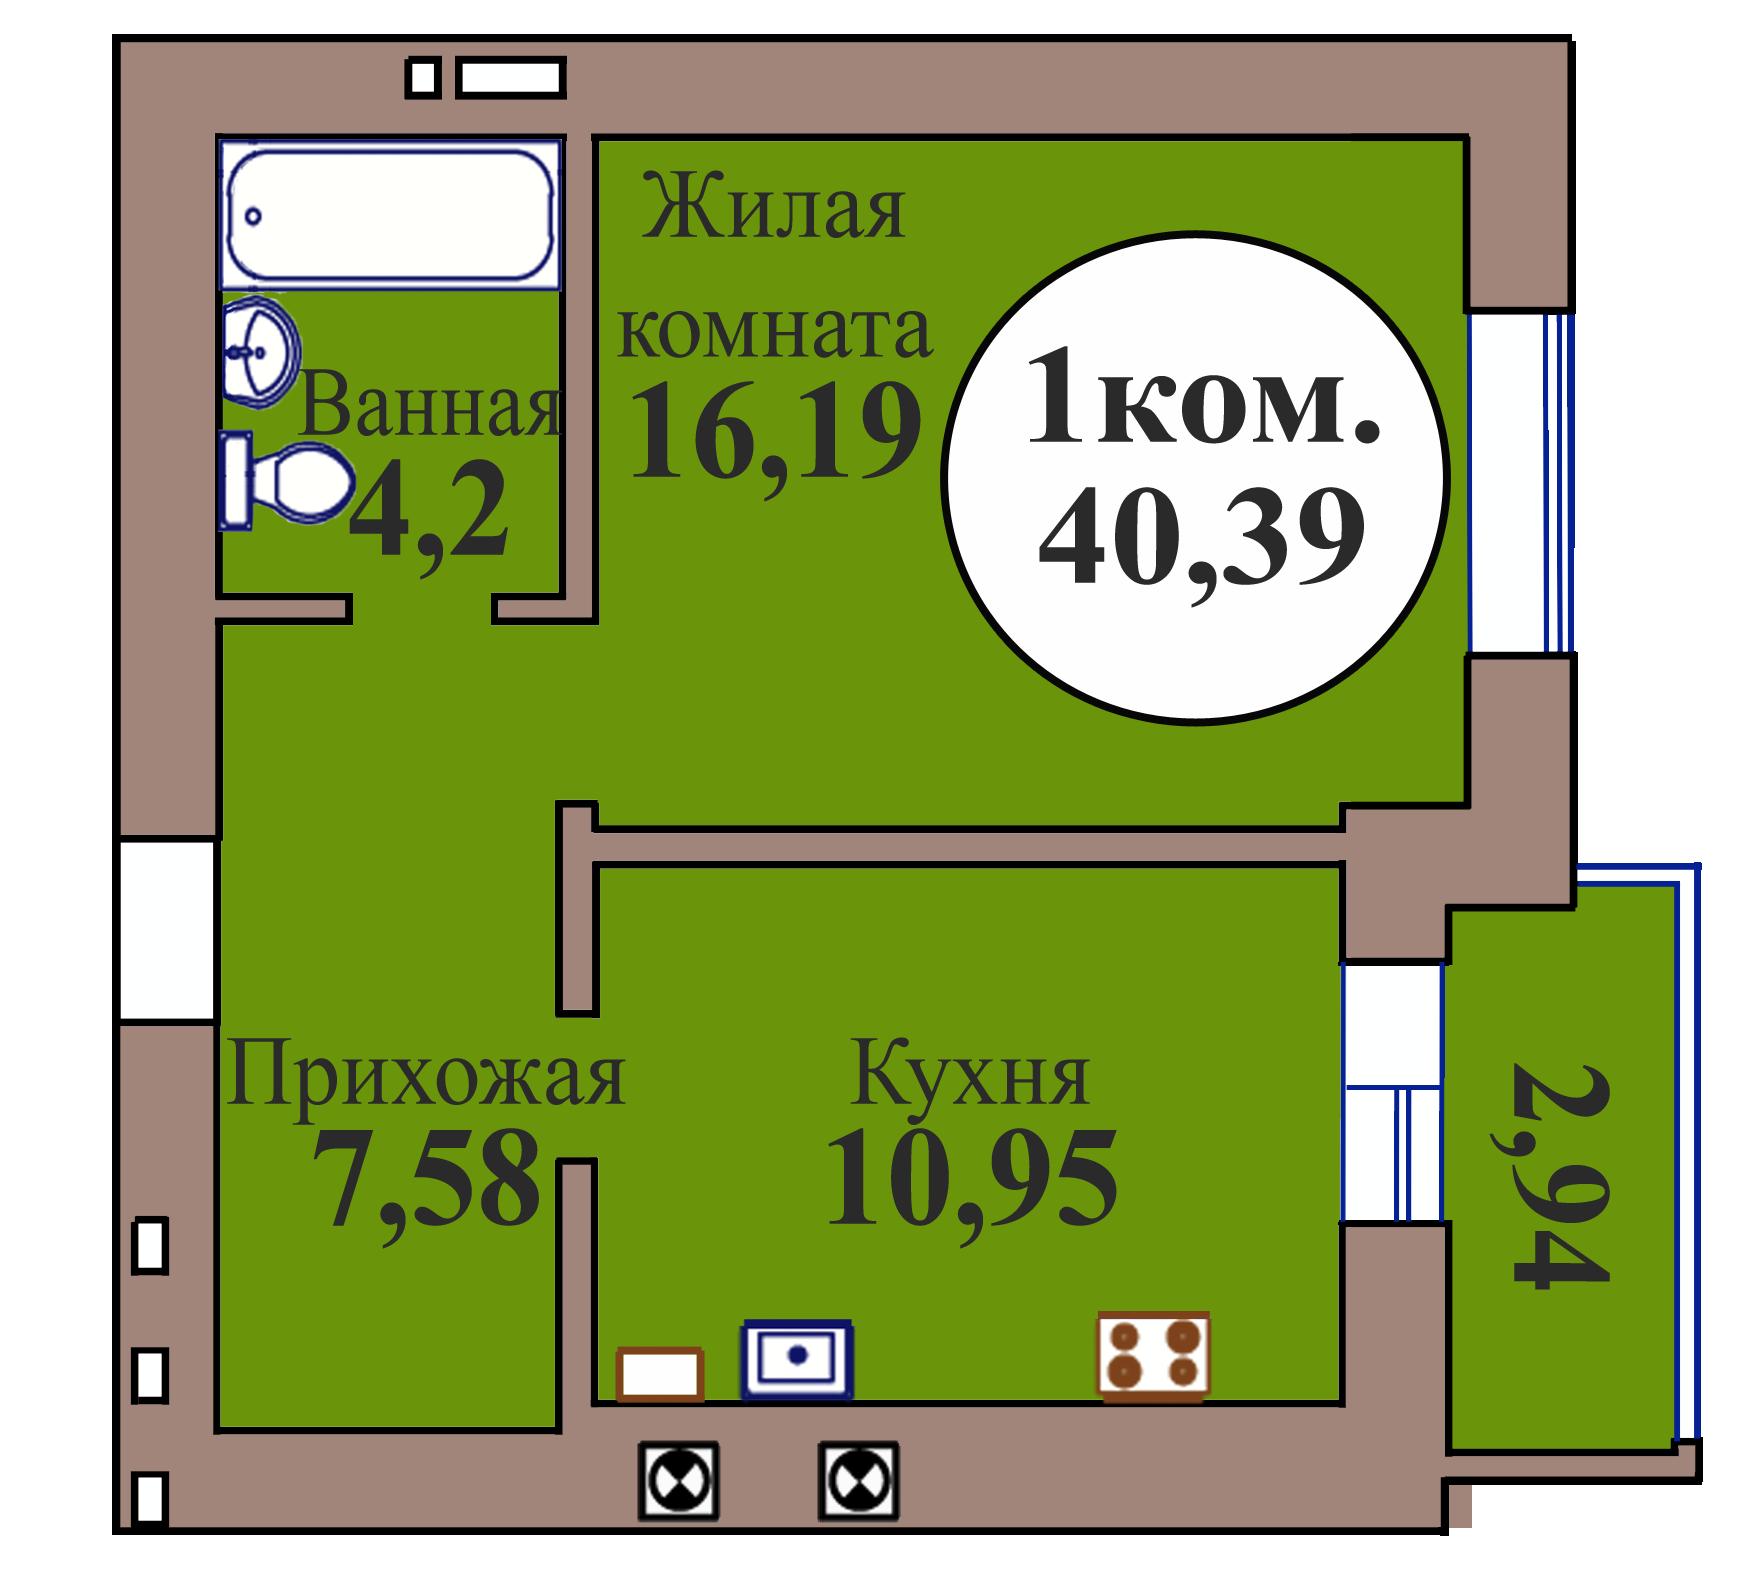 1-комн. кв. по пер. Калининградский, 5 кв. 105 в Калининграде